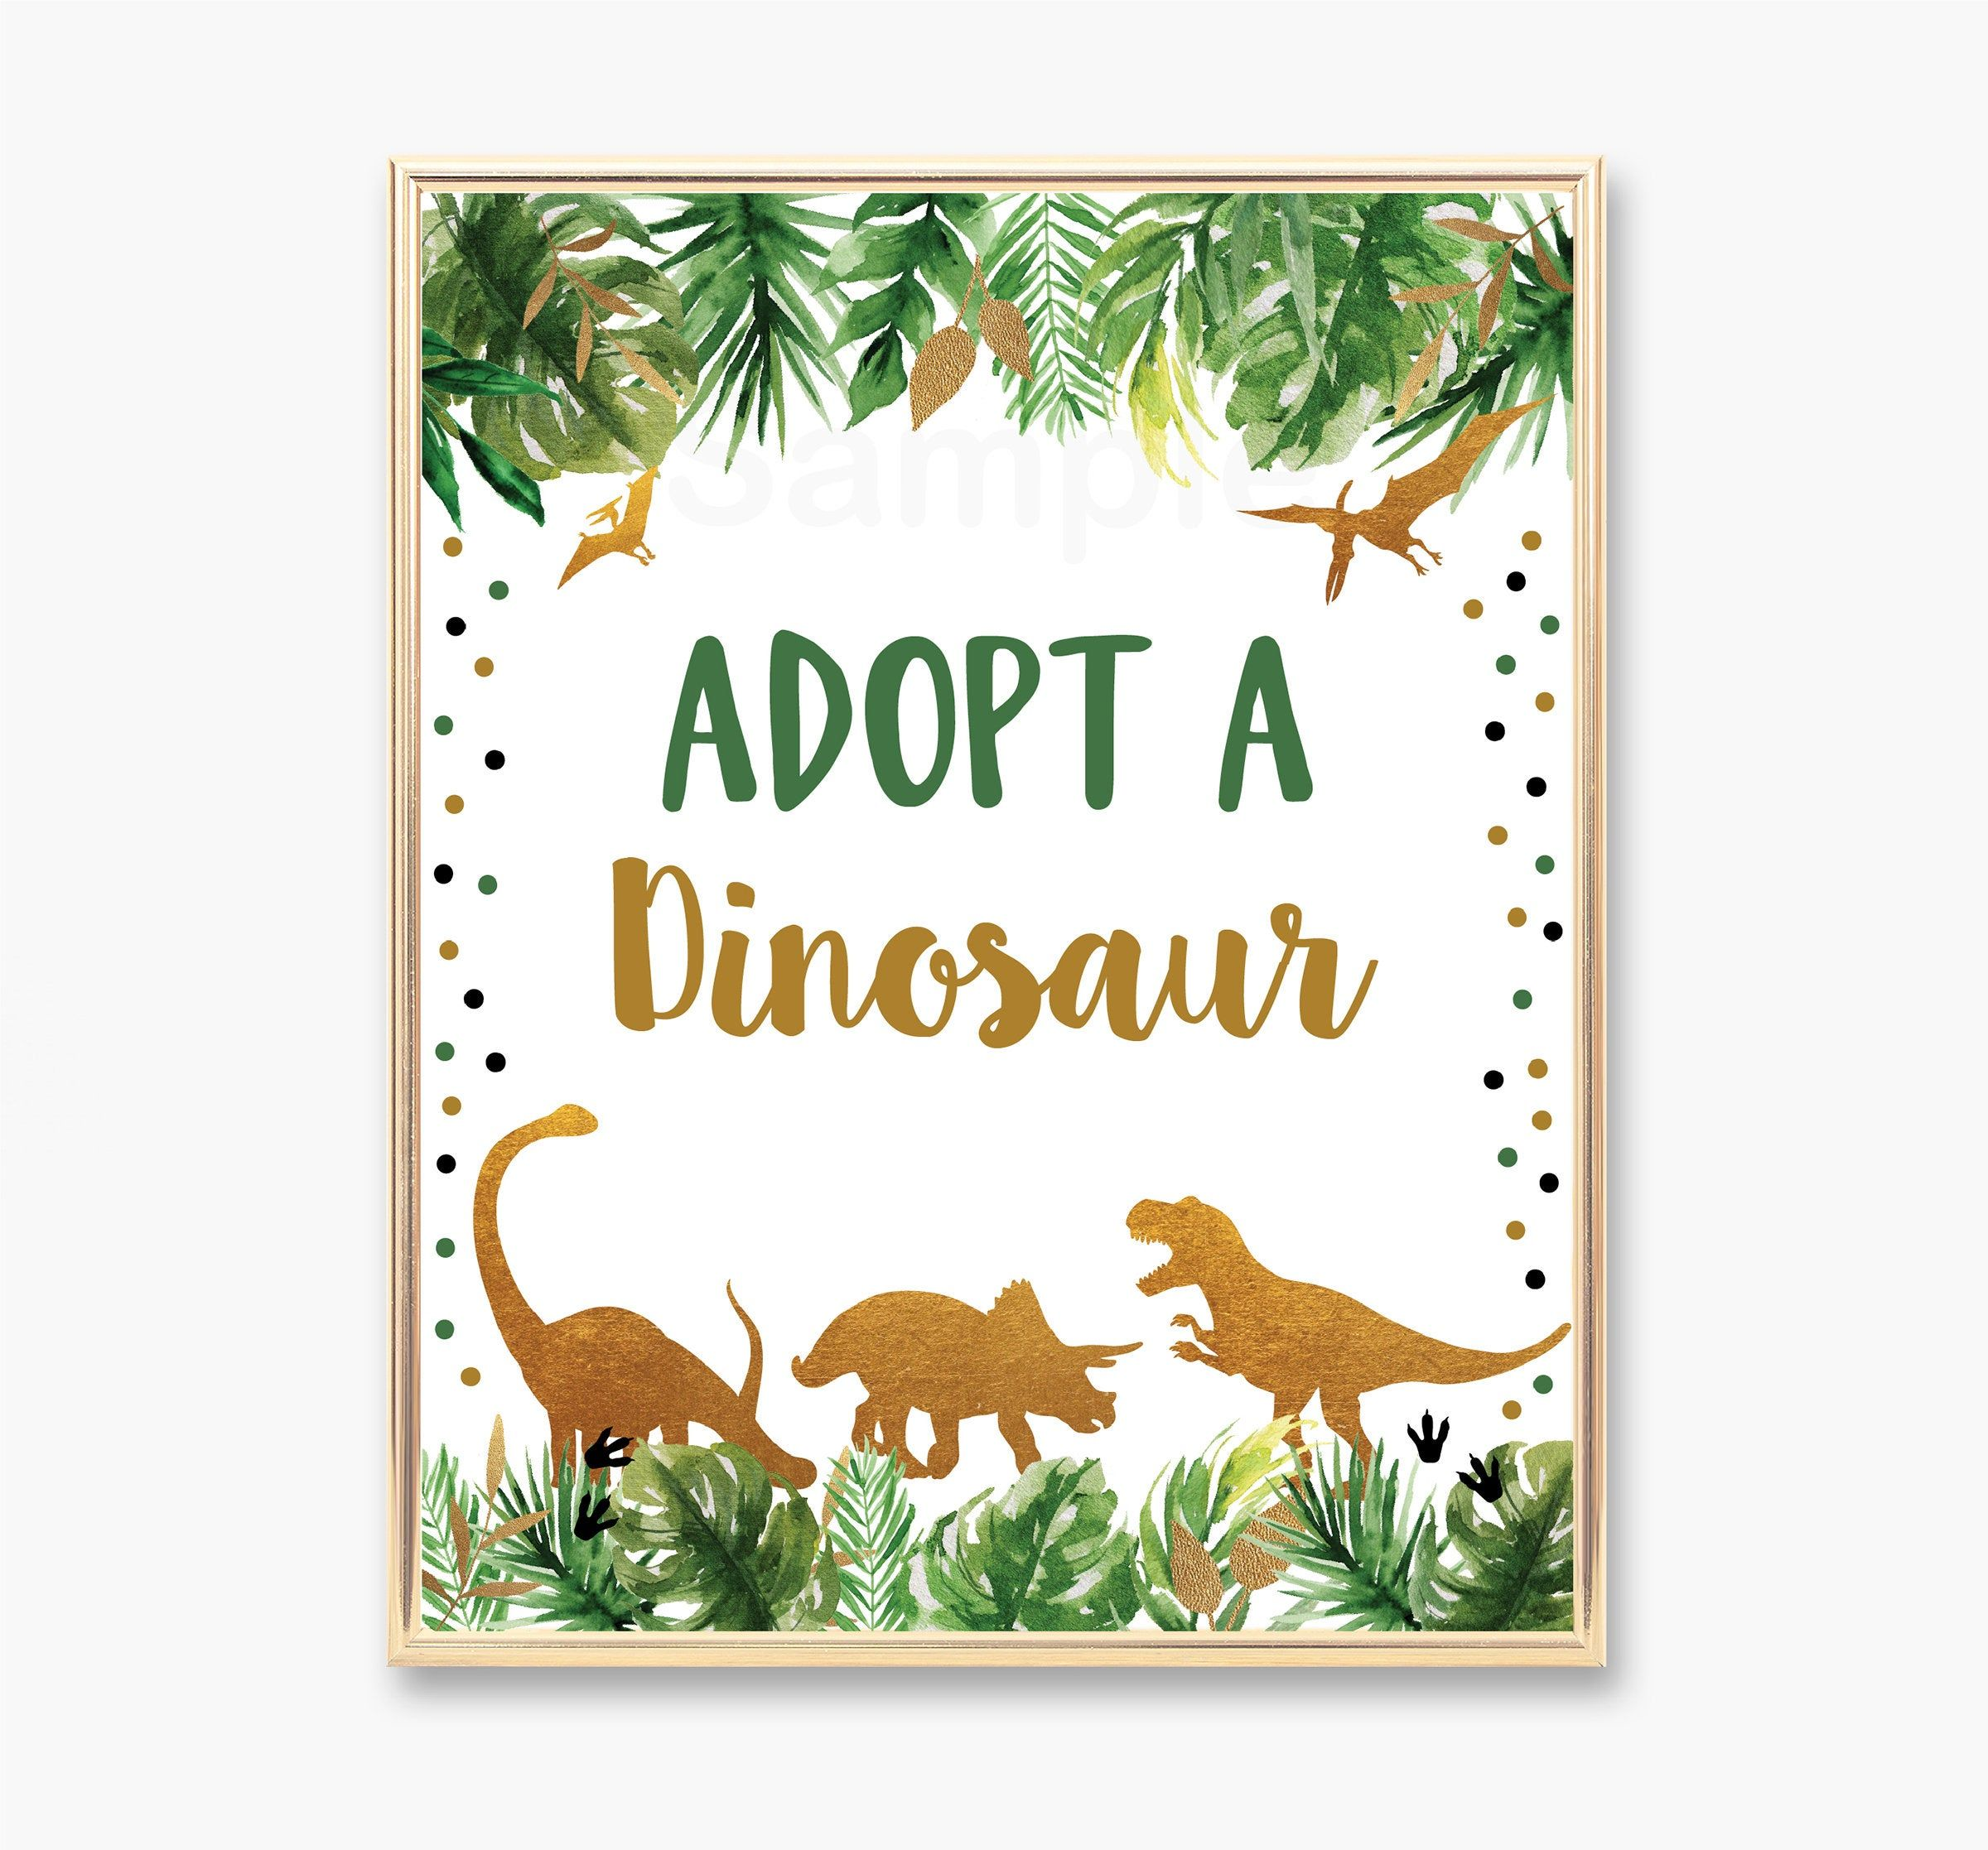 Adopt A Dinosaur Birthday Sign Dinosaur Birthday Party Gold Etsy Birthday Sign Dinosaur Party Favors Dinosaur Themed Birthday Party